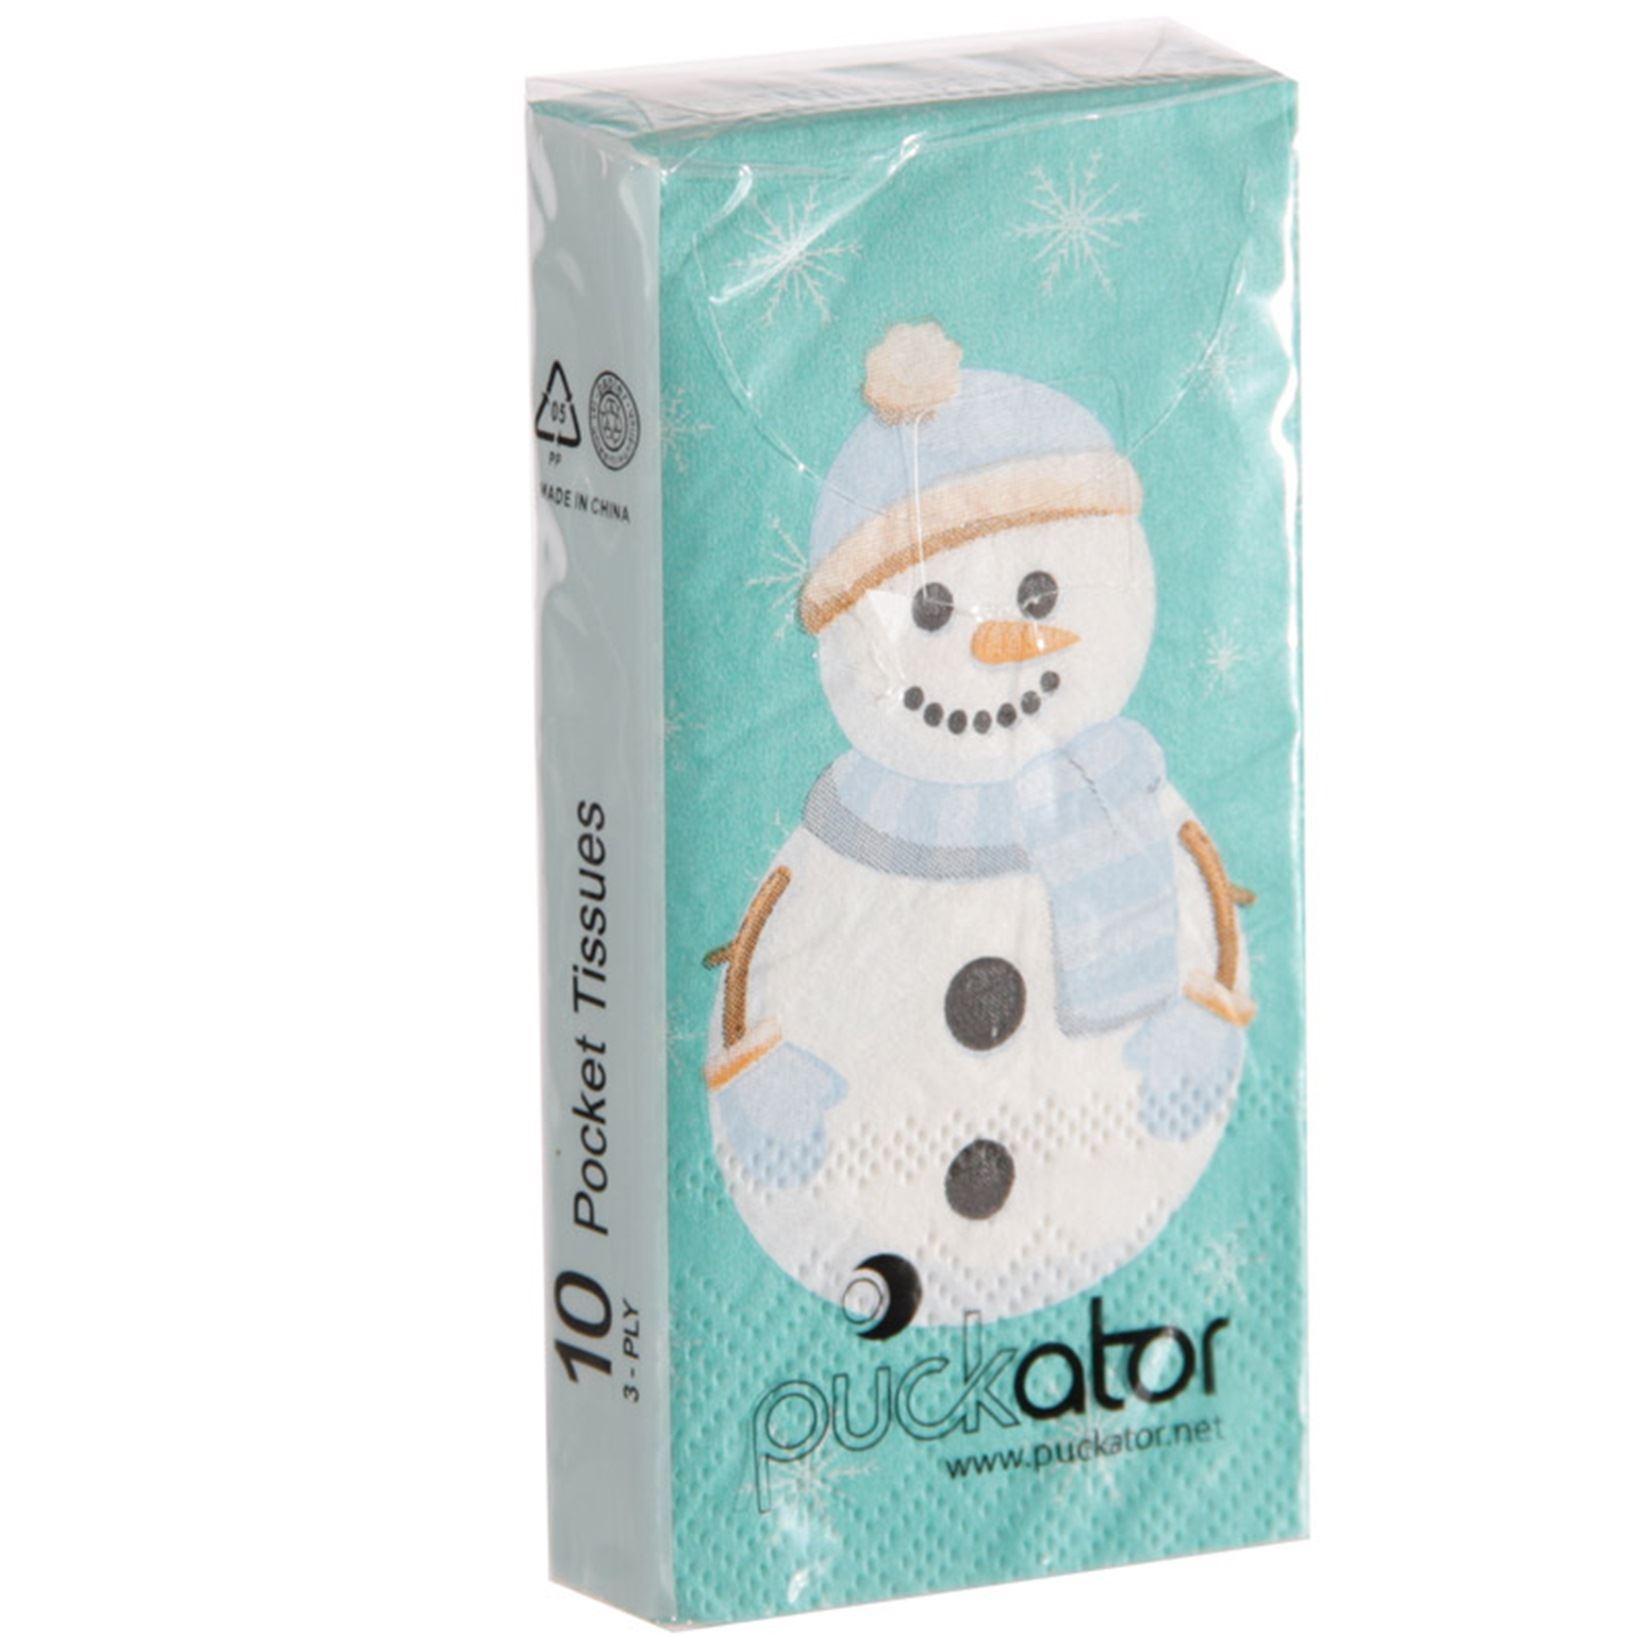 10 paper pocket 3 ply tissue snowman snowflake handbag